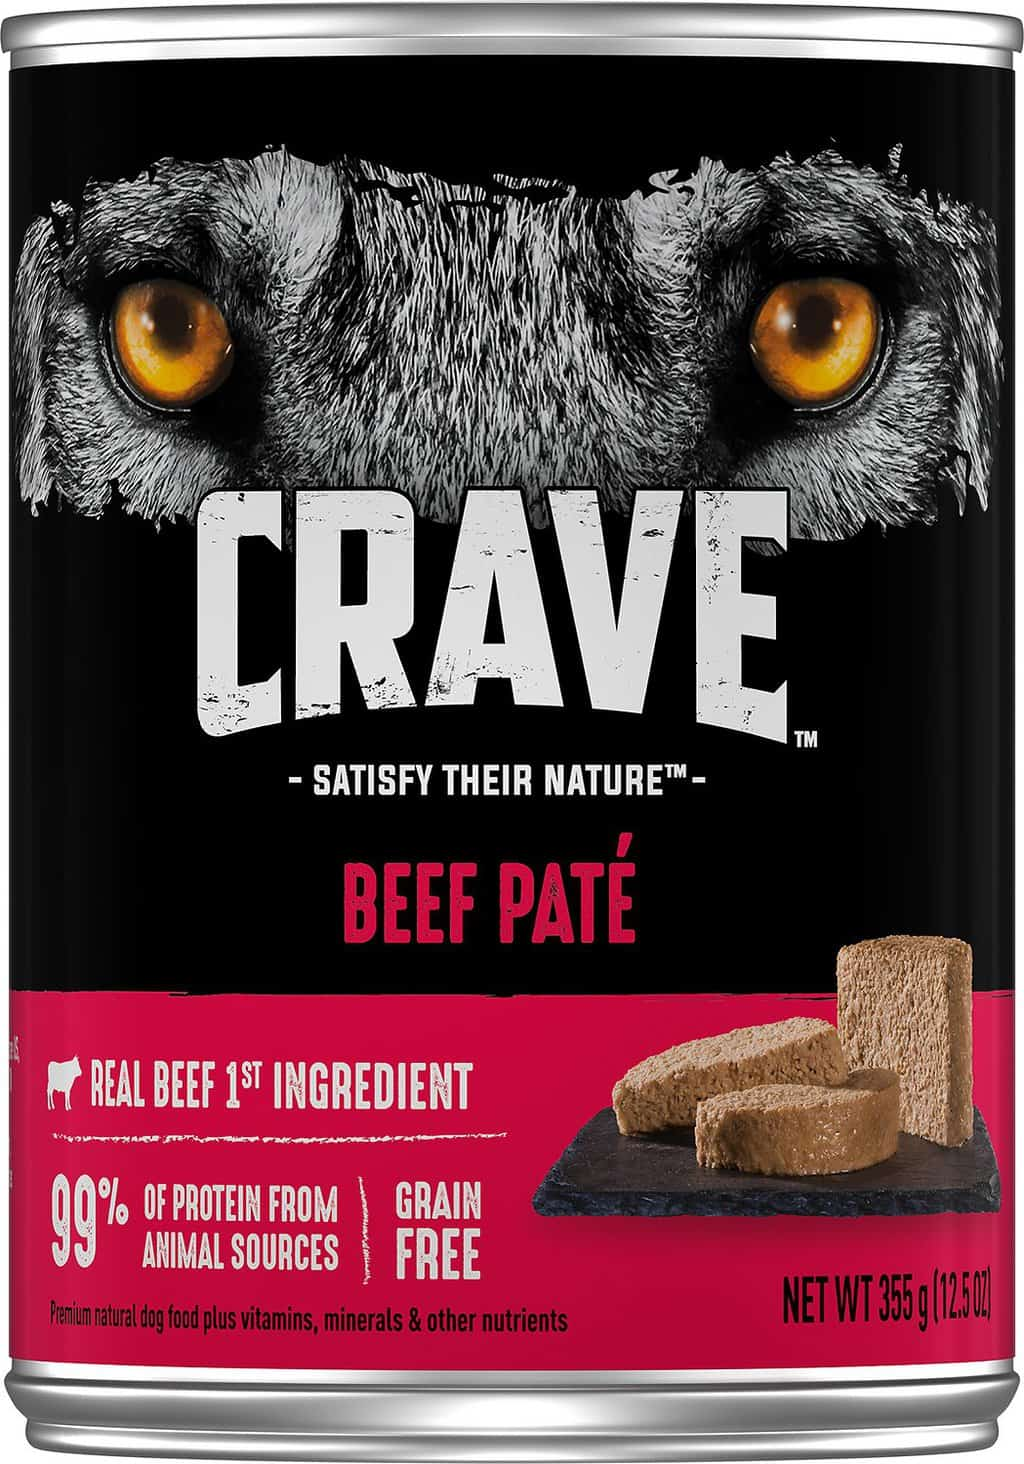 Crave Dog Food Review 2020: Best Canine Ancestral Diet? 14